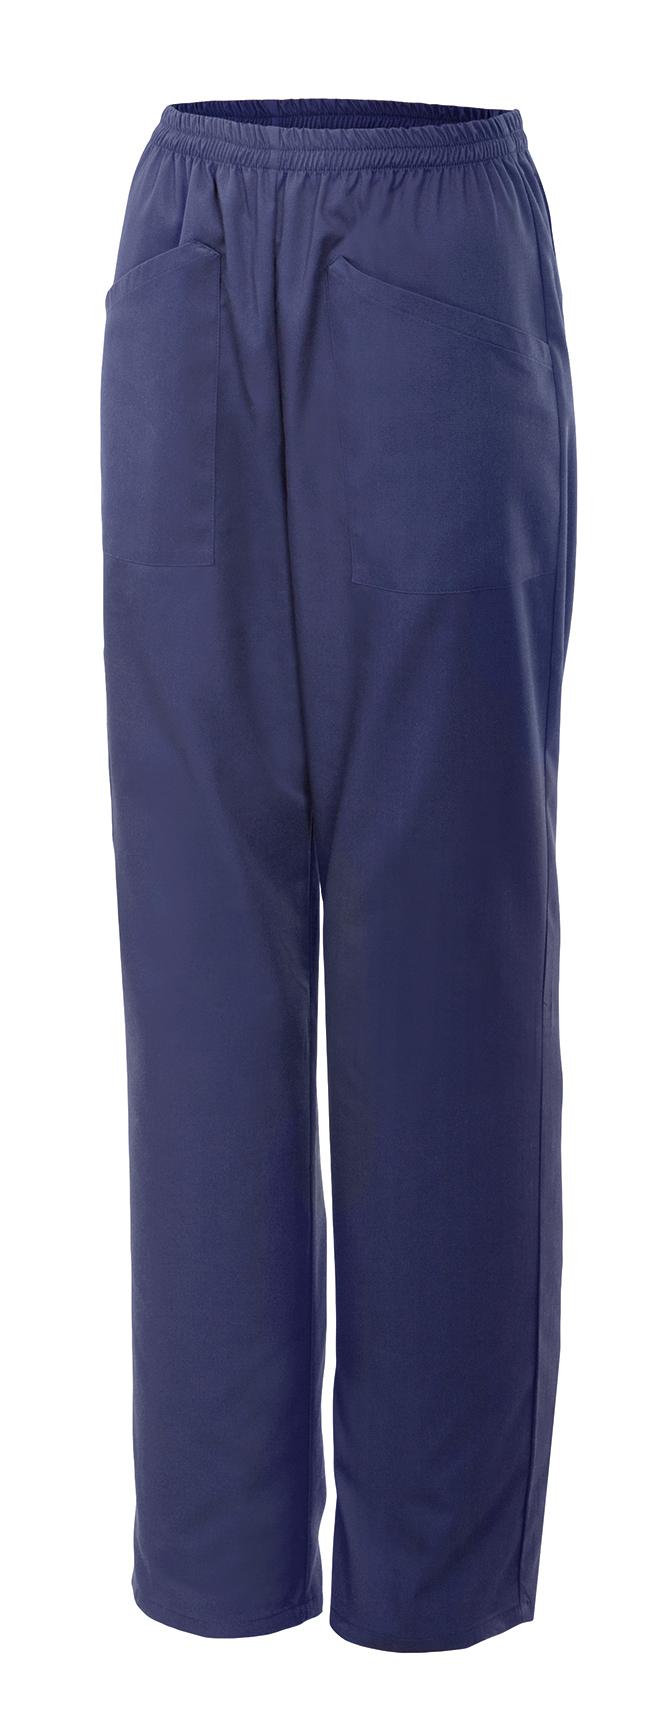 Pantalón Pijama de Mujer Velilla Serie 319